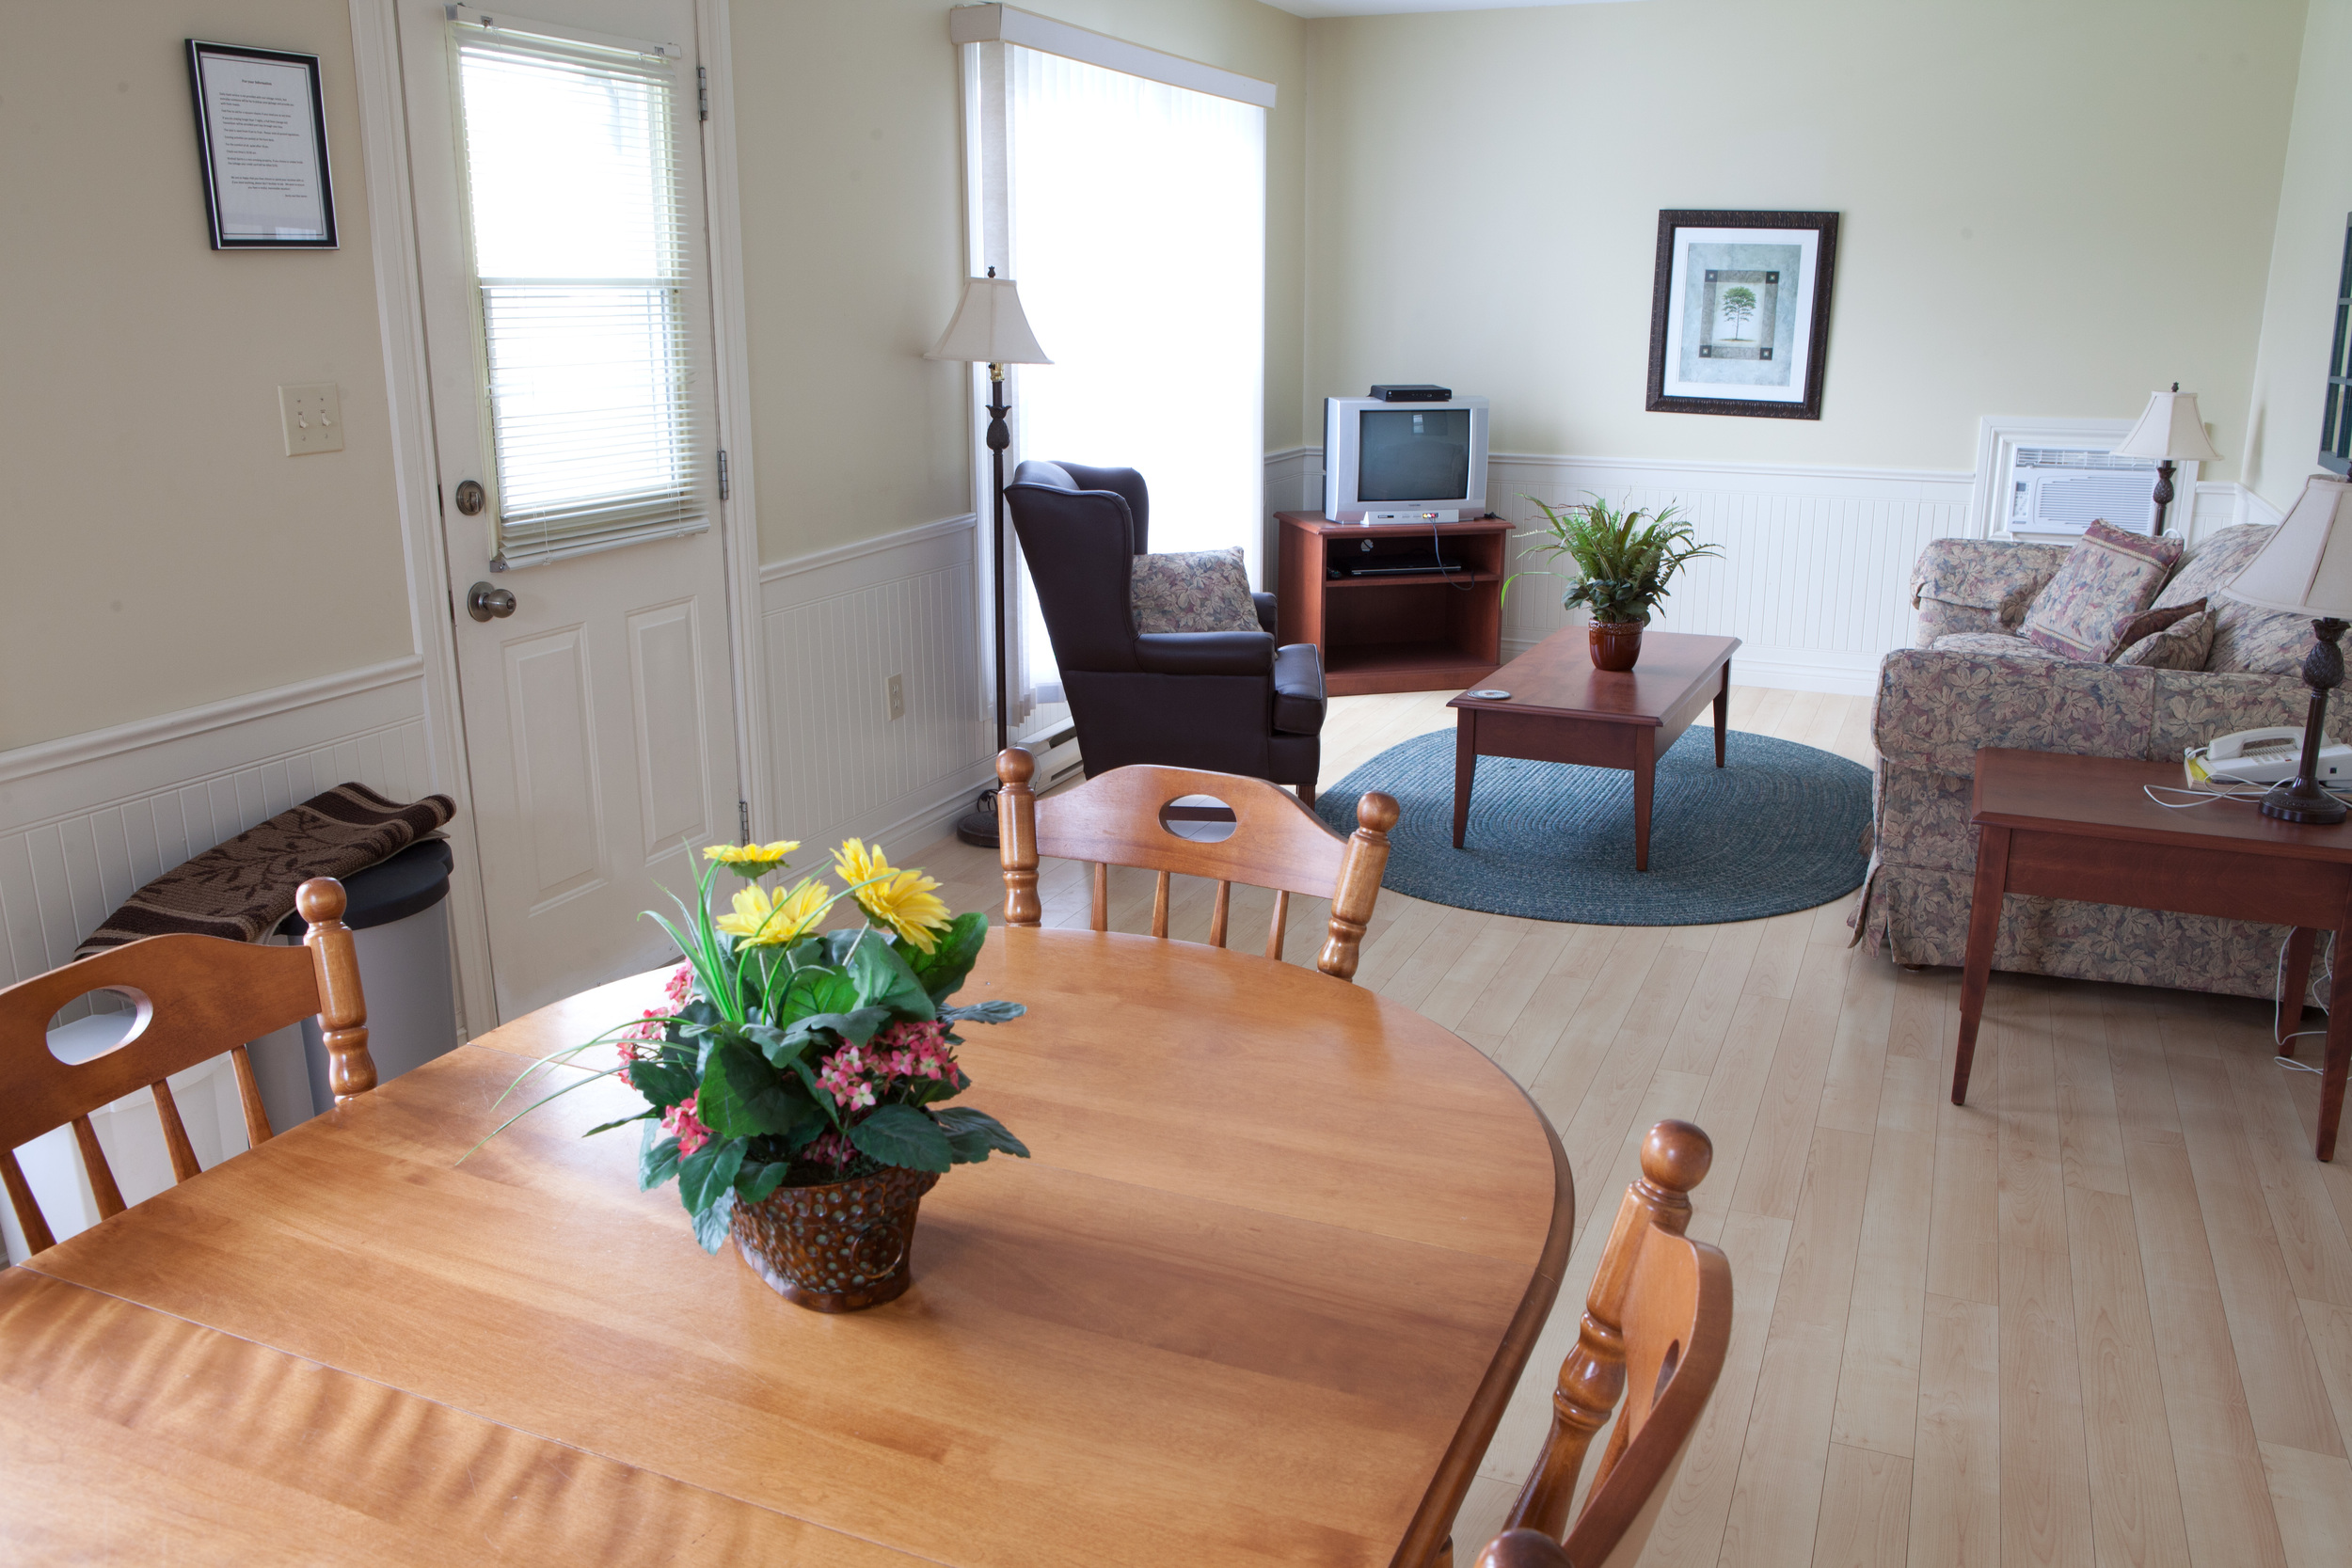 Standard Cottage Kitchen and Living Room